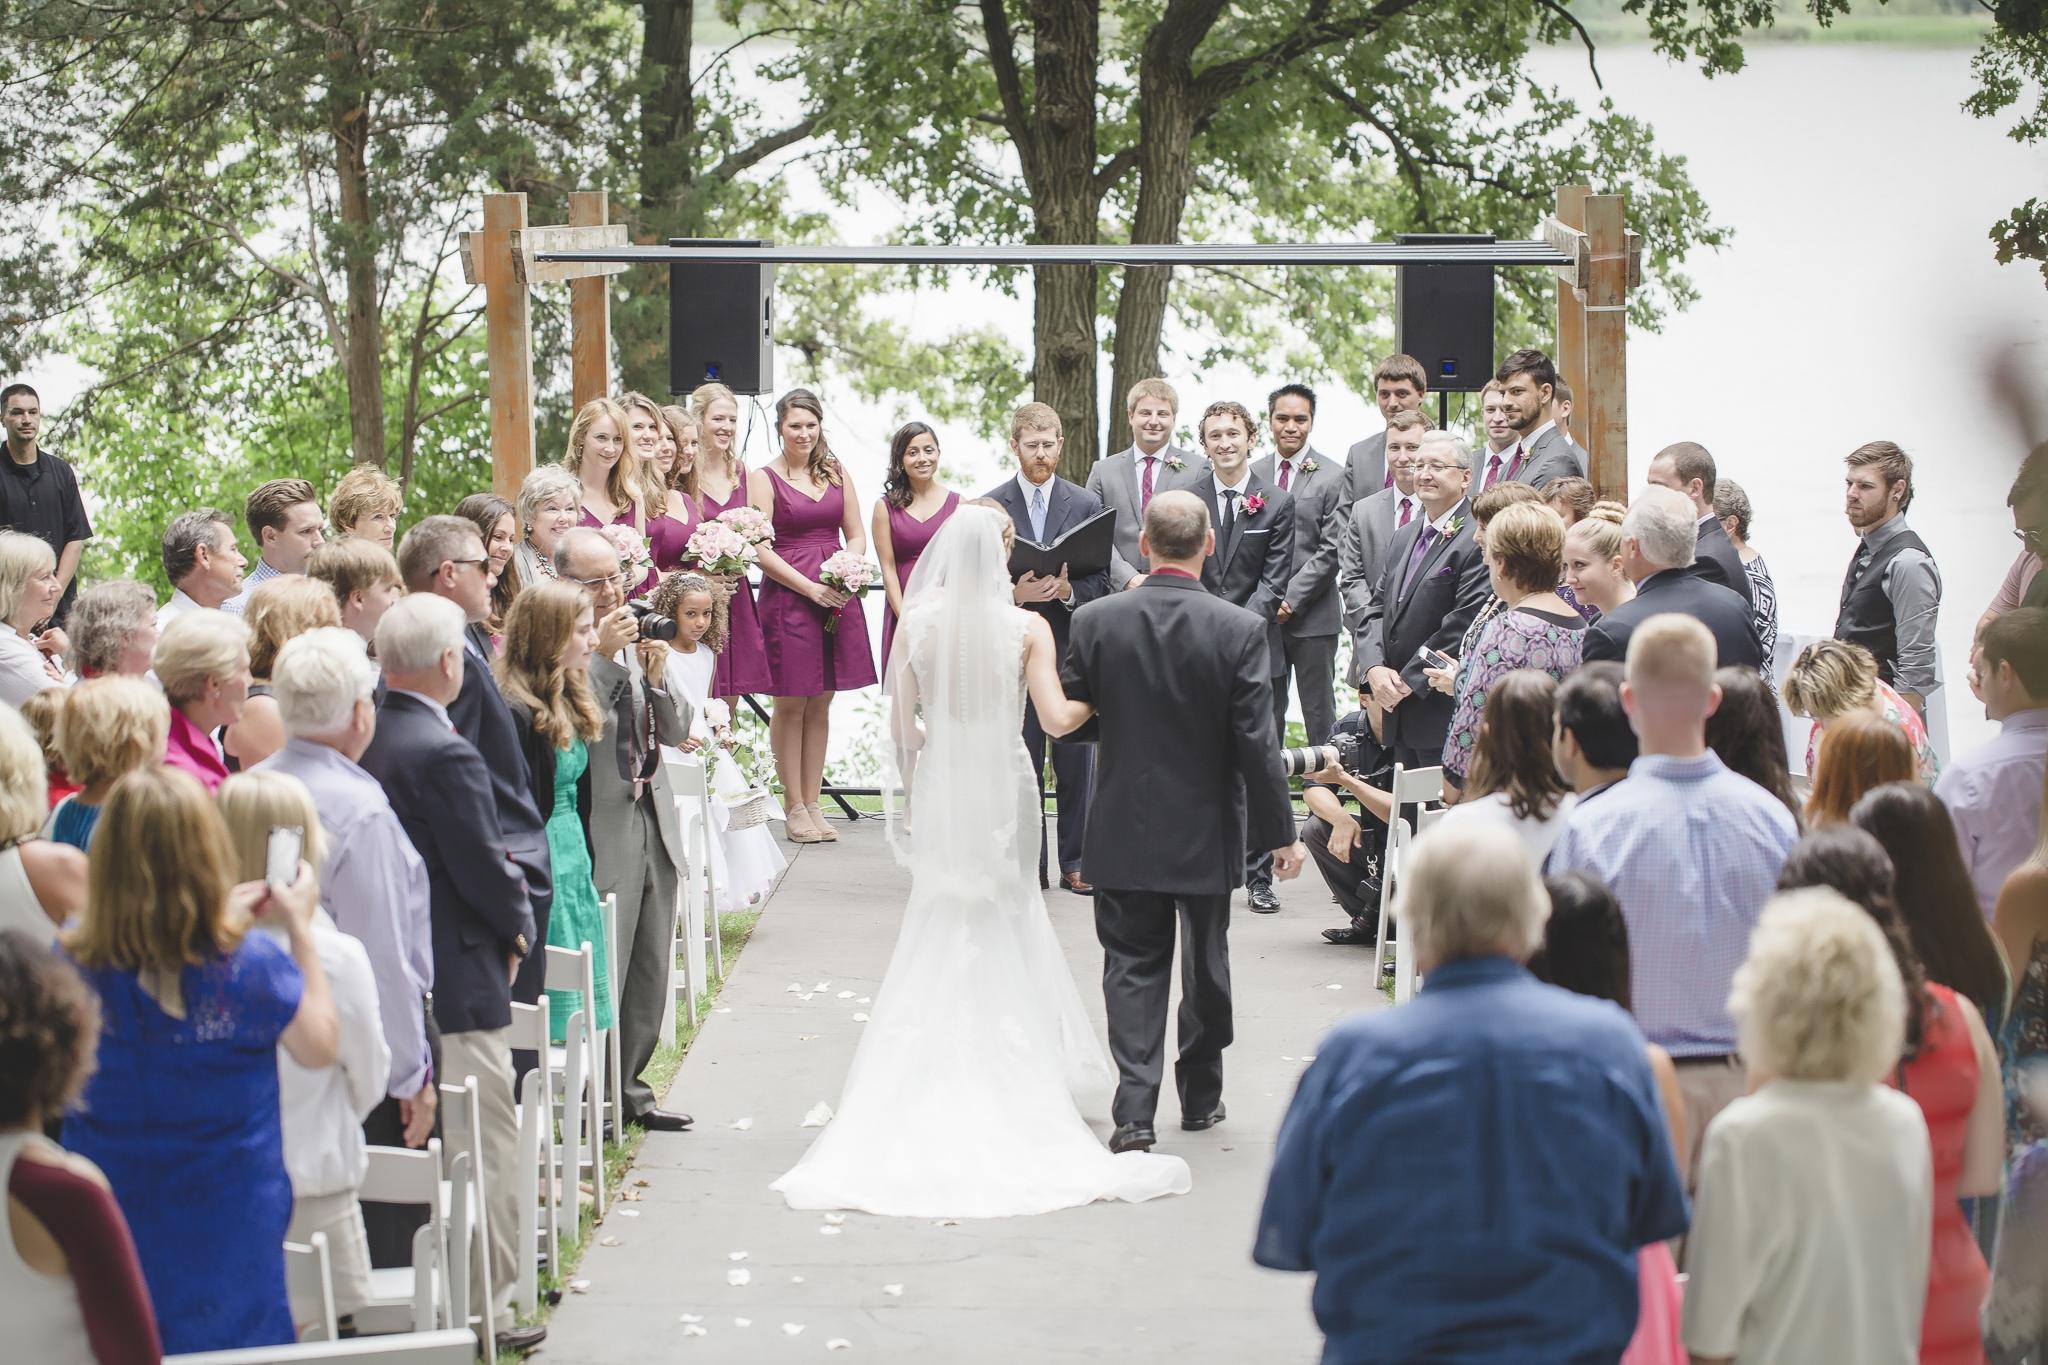 james j hill library wedding photography-12.jpg